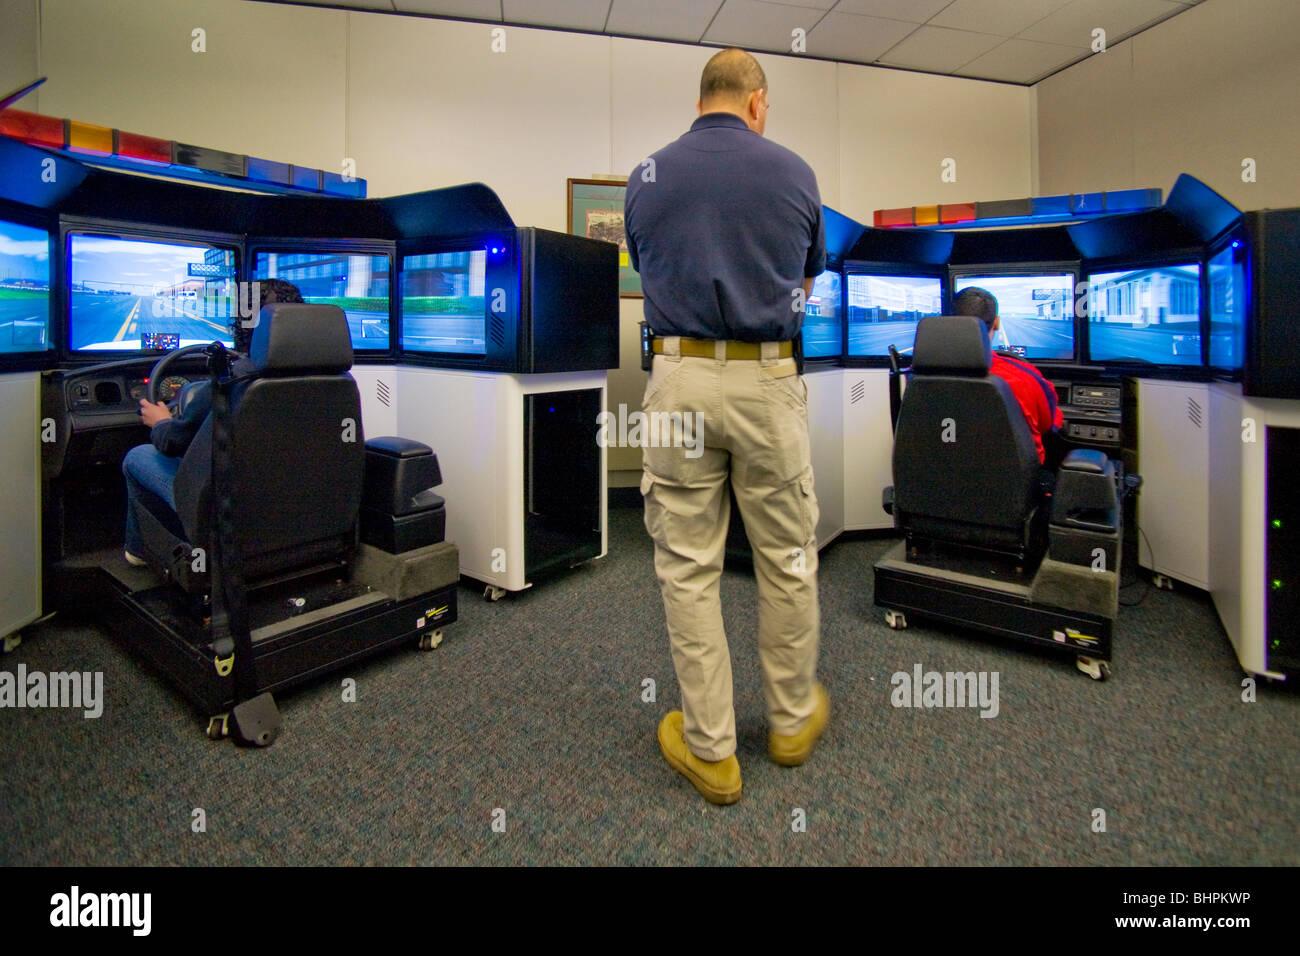 Simulators Stock Photos & Simulators Stock Images - Alamy